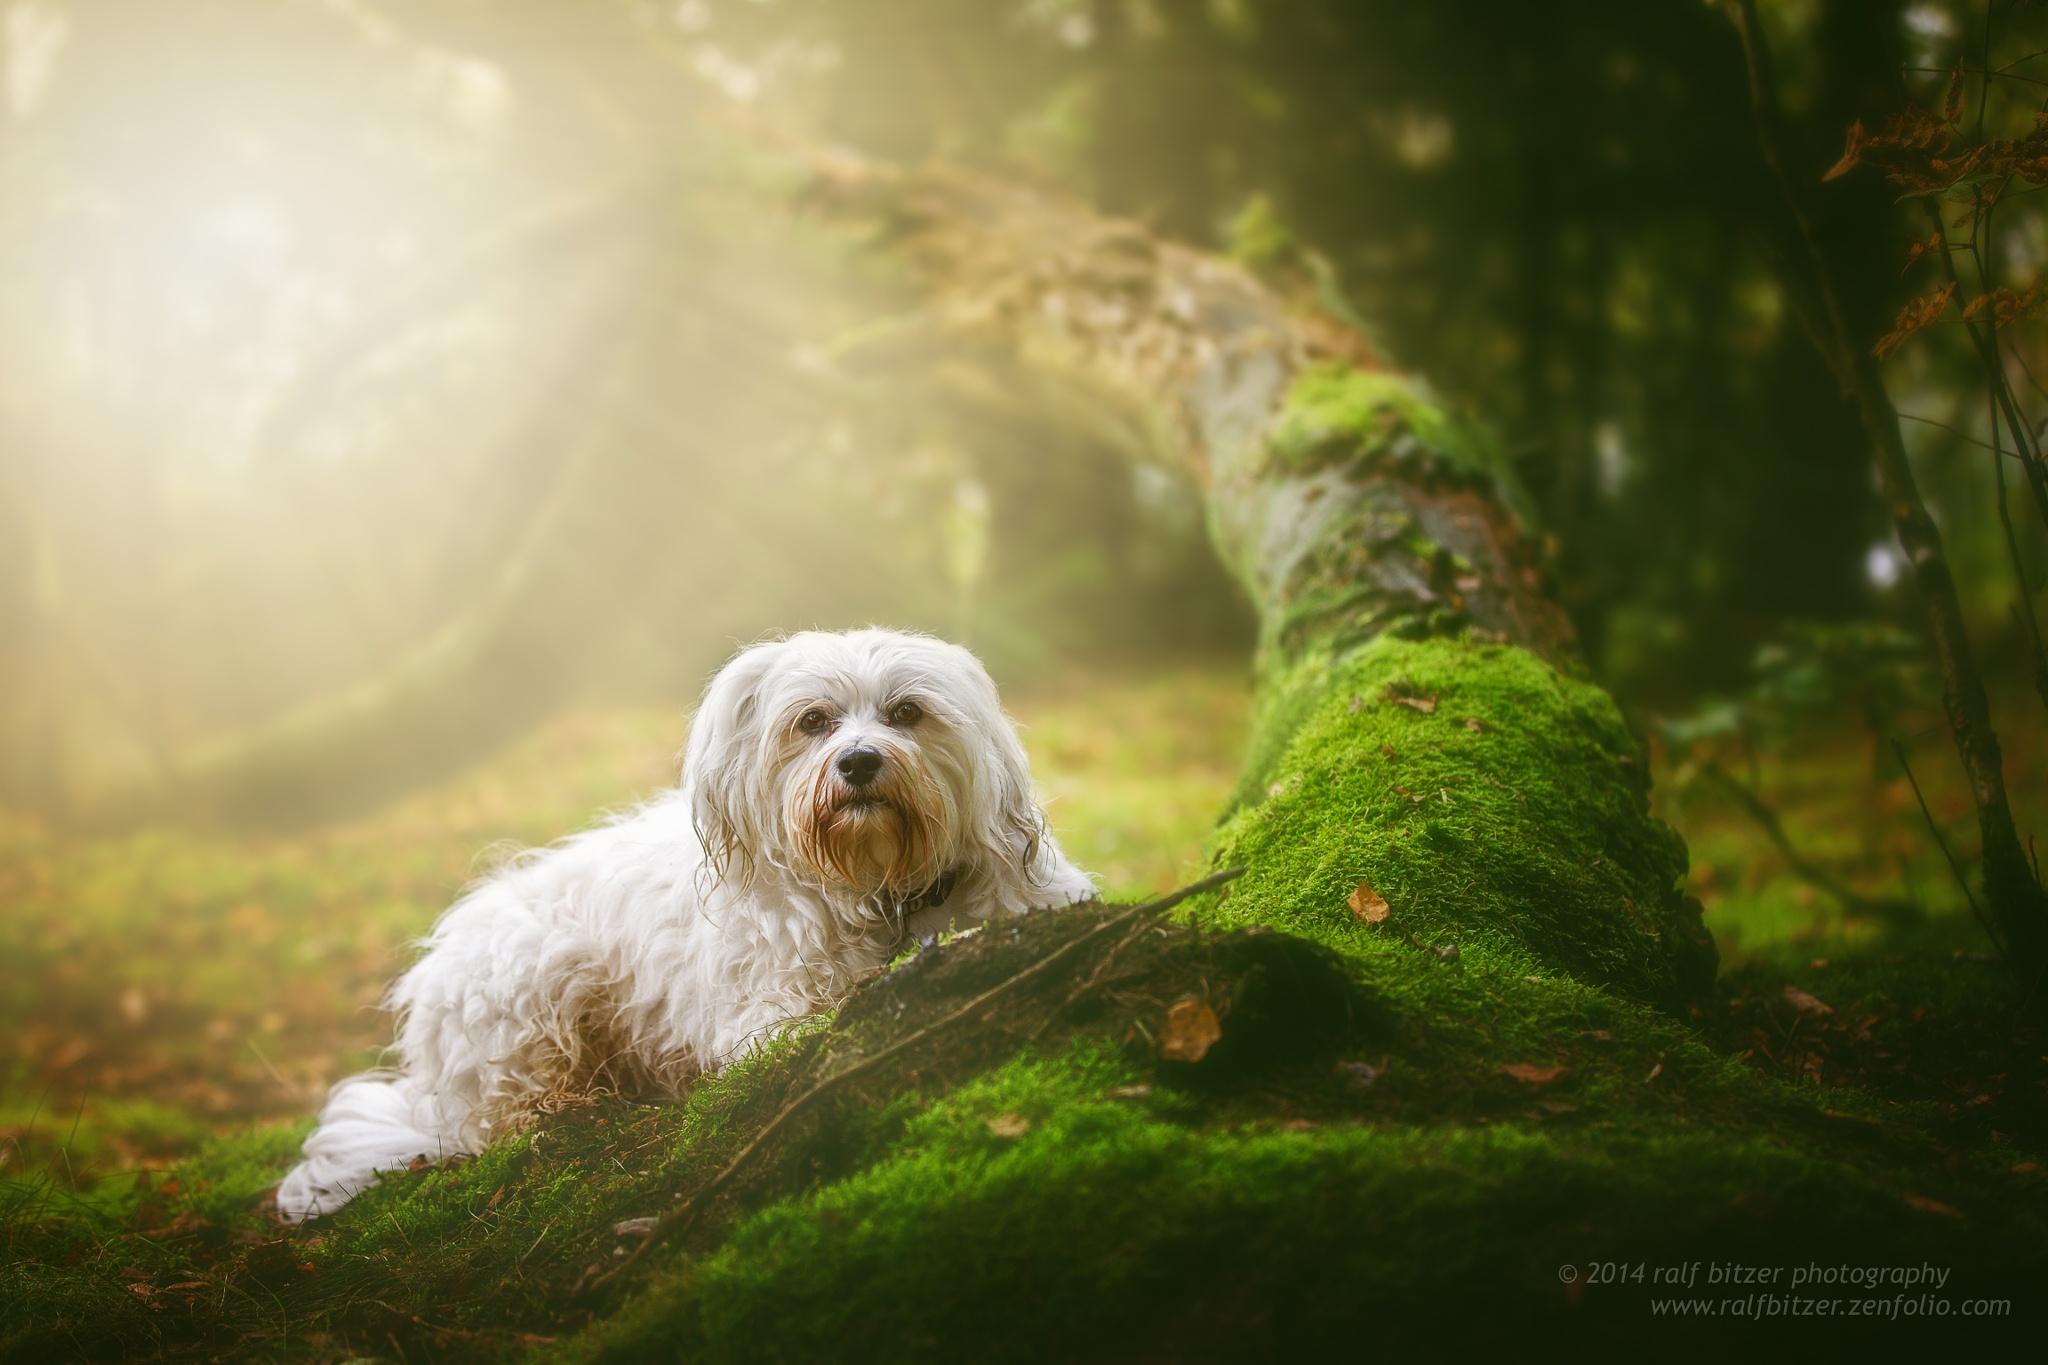 Soft light by Ralf Bitzer